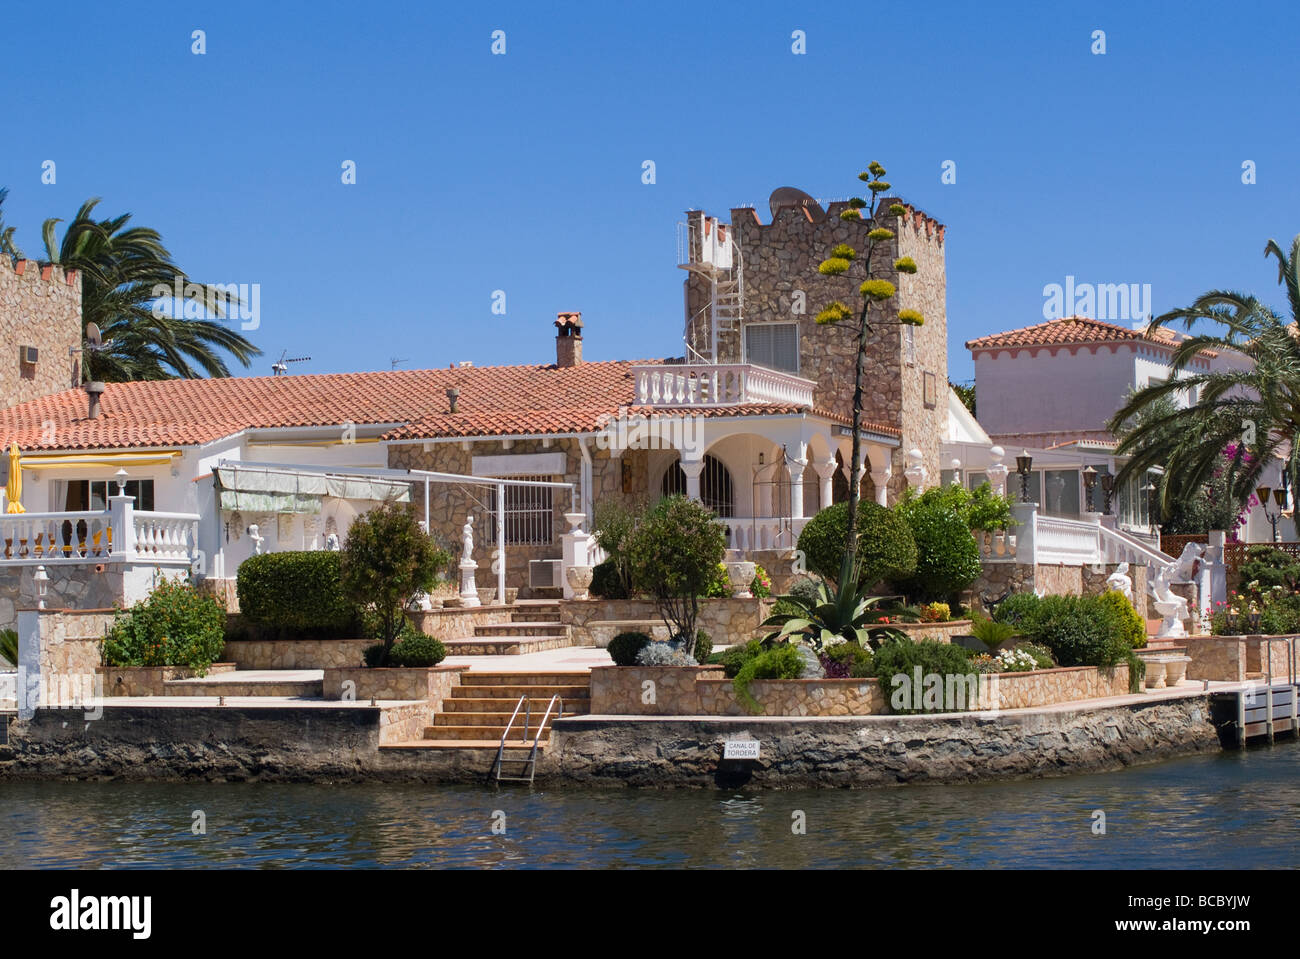 Beautiful villas on the canal network at empuriabrava costa brava spain